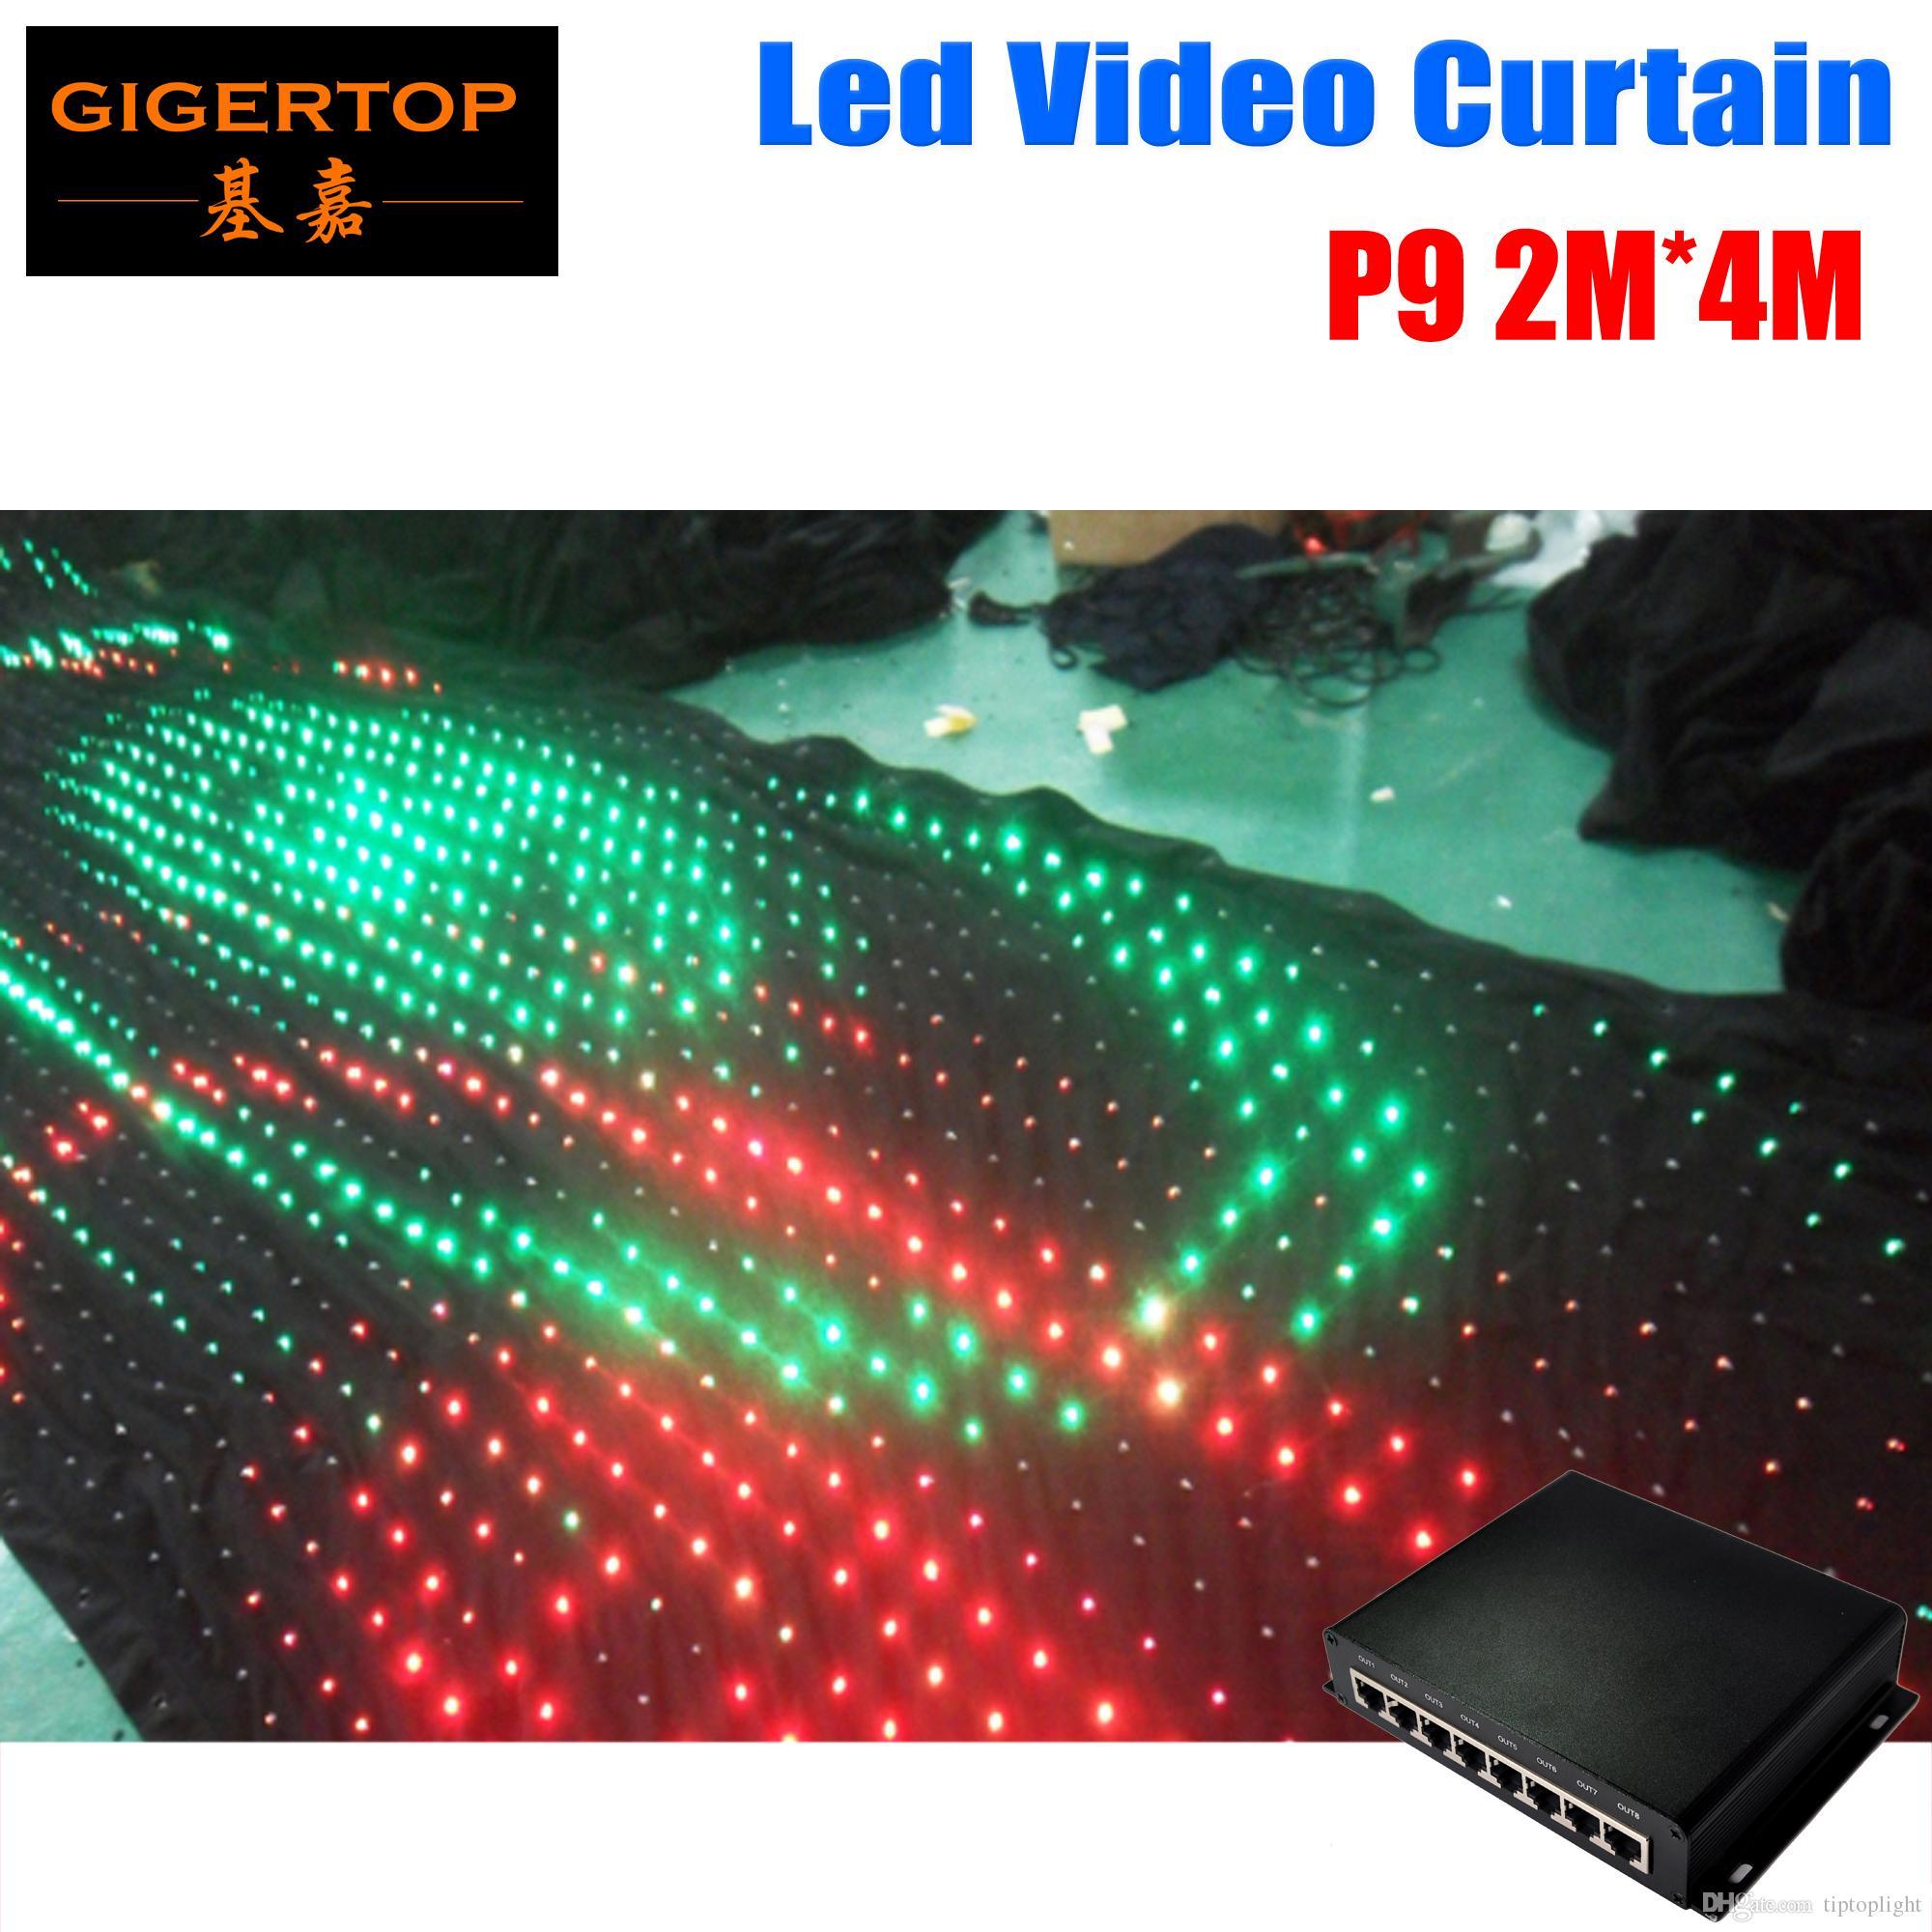 P9 2M * 4M PC وضع تحكم LED فيديو الستار عن خلفية زفاف مخصصة للحريق ضوء الستار DJ مرحلة خلفية